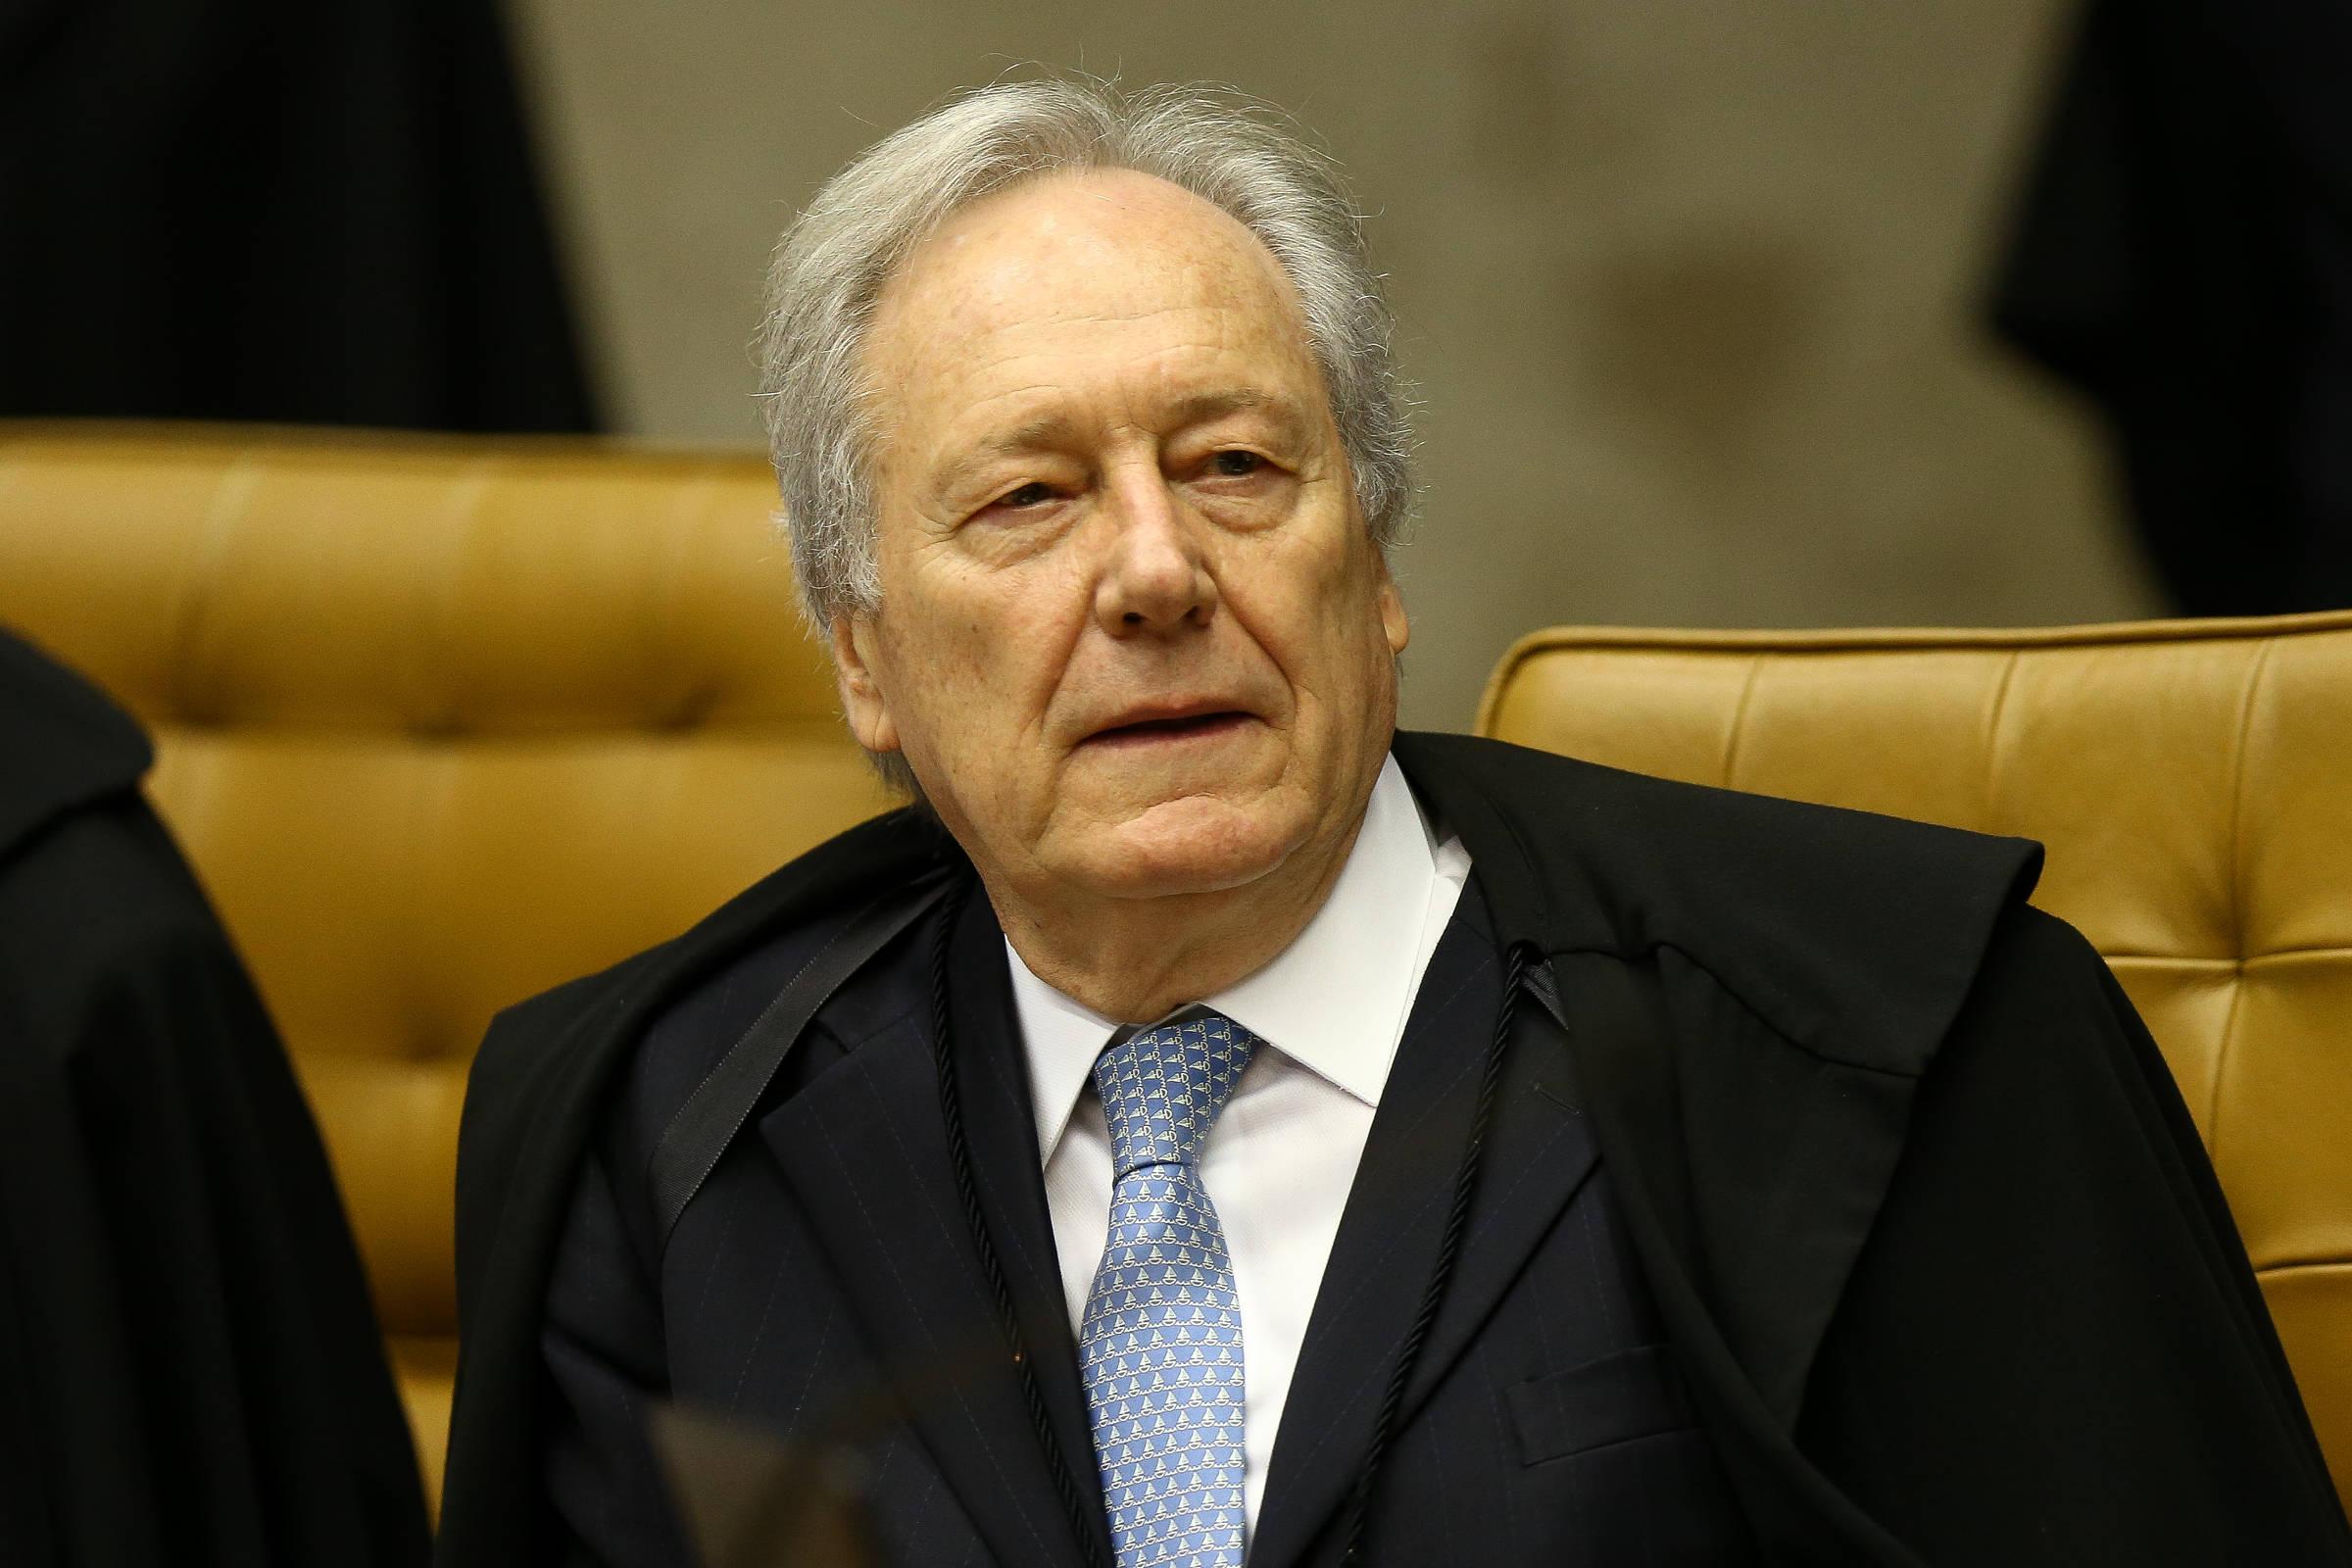 Lewandowski determina que PF dê à defesa de Lula acesso integral às conversas da Lava Jato